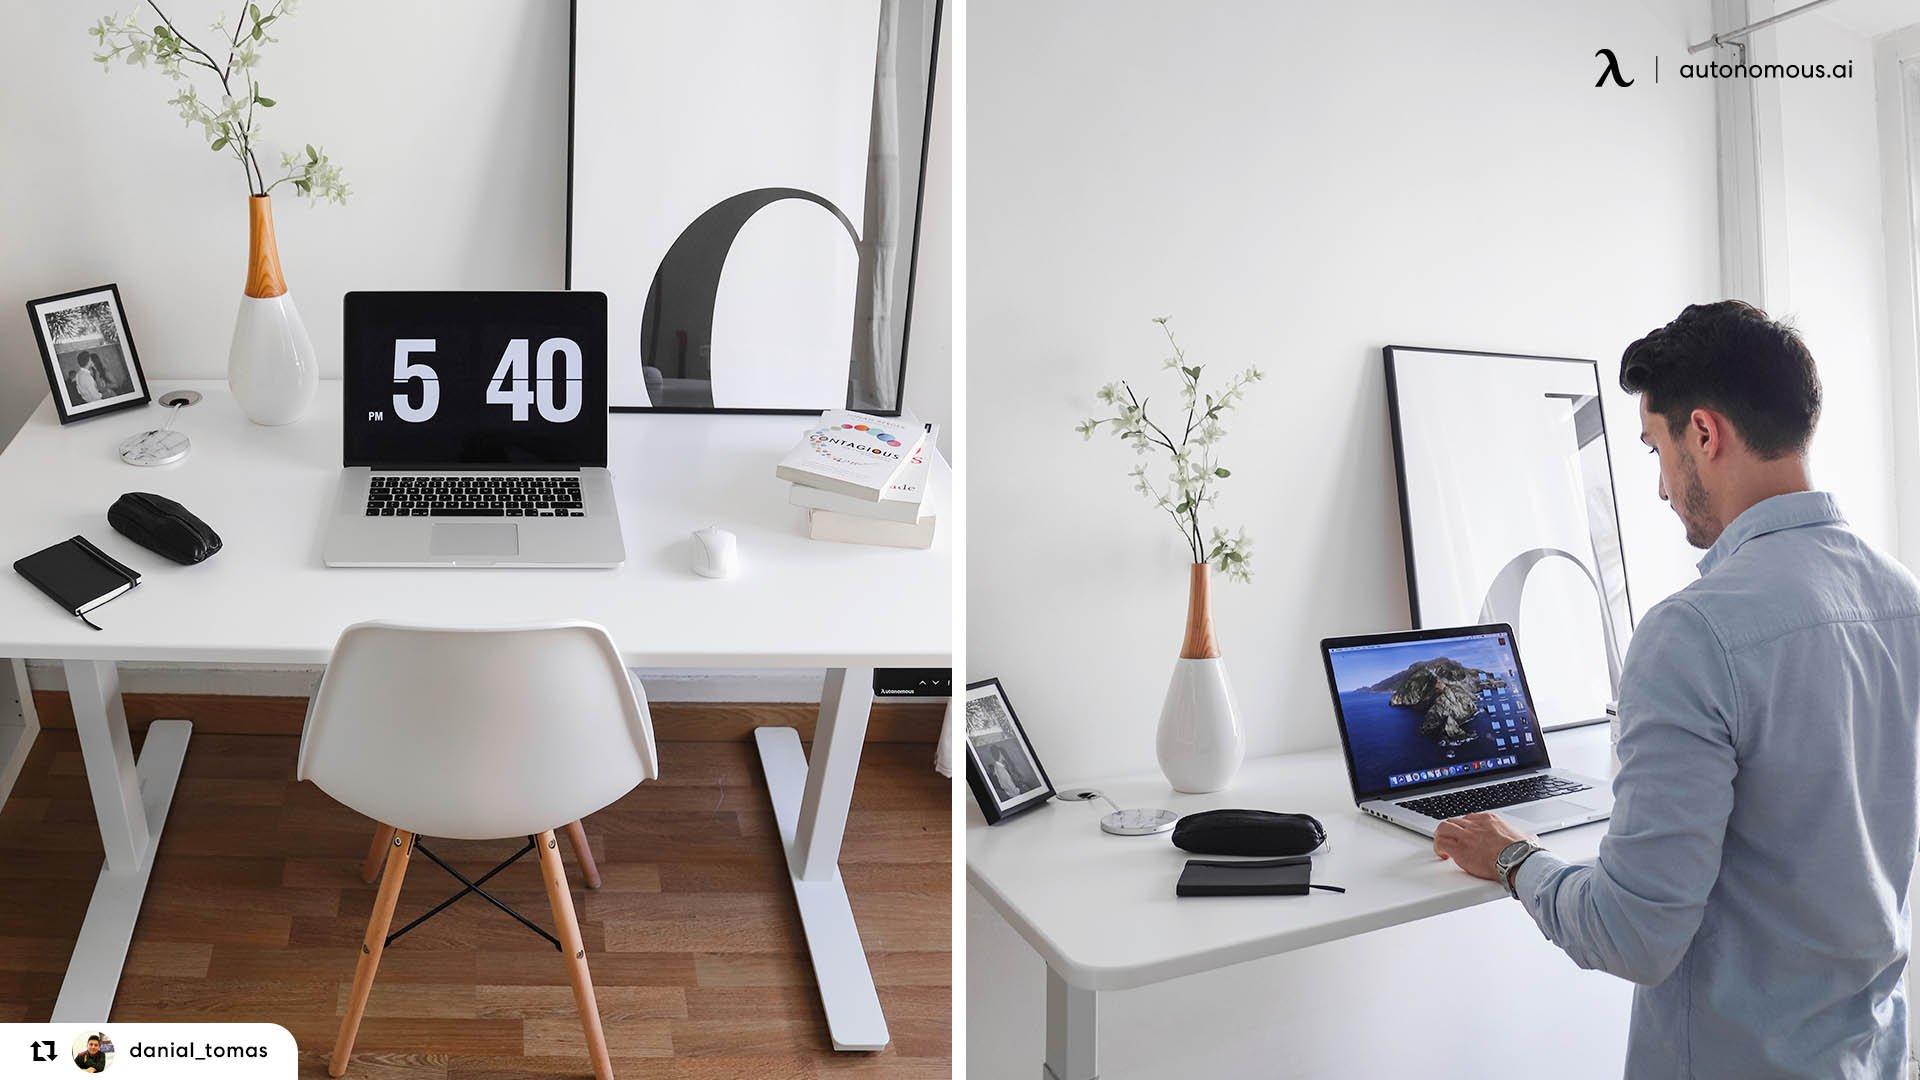 Empowering work environment